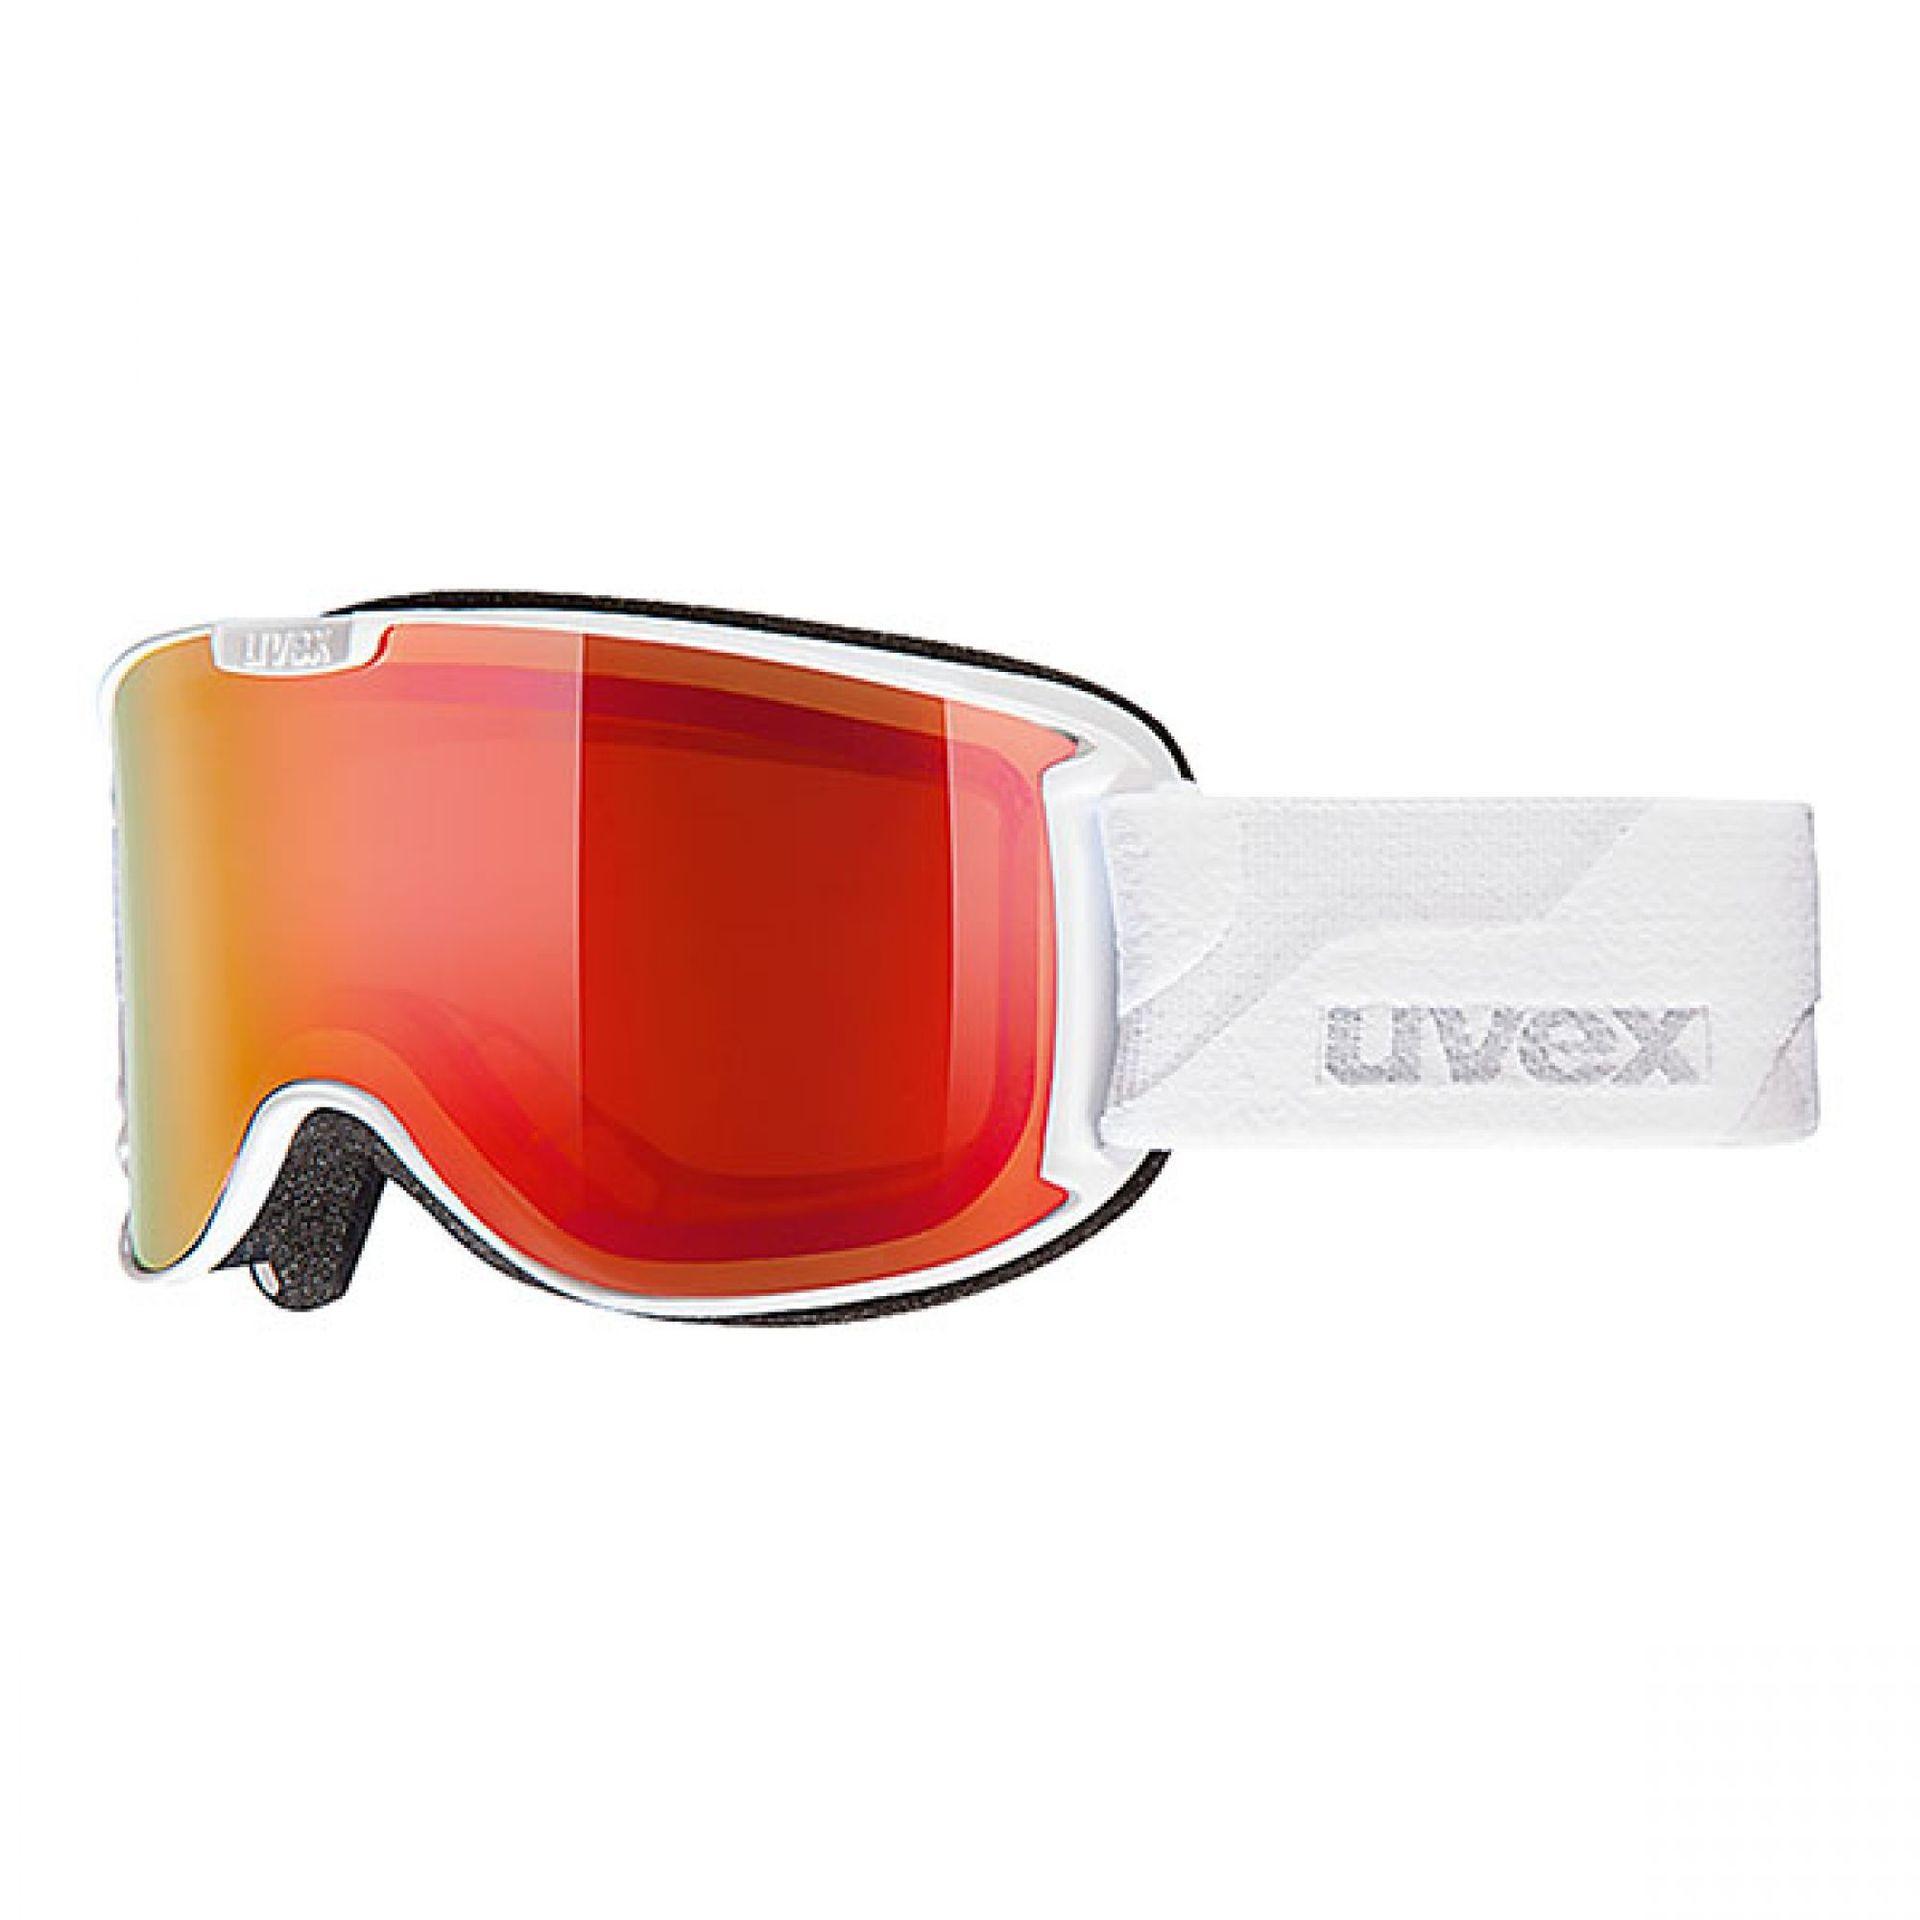 GOGLE UVEX # SKYPER WHITE LITEMIRROR RED POLAVISION ROSE S3